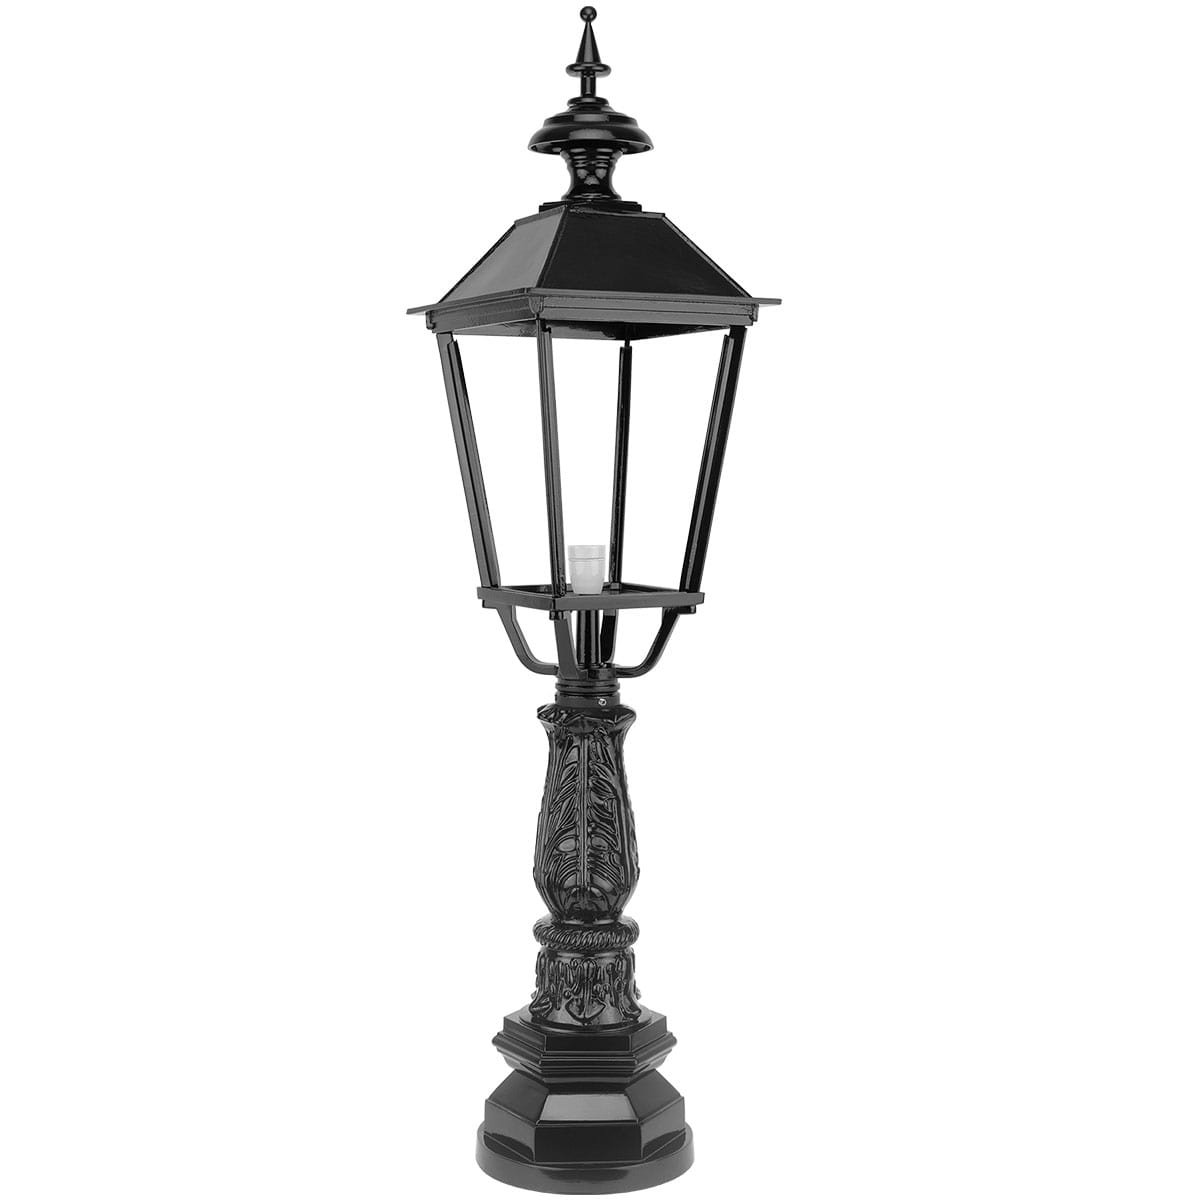 Outdoor Lighting | Classic Rural | Lantern lamp square Bovenstehuis - 124 cm Outdoor Lighting Classic Rural Lantern lamp square Bovenstehuis - 124 cm